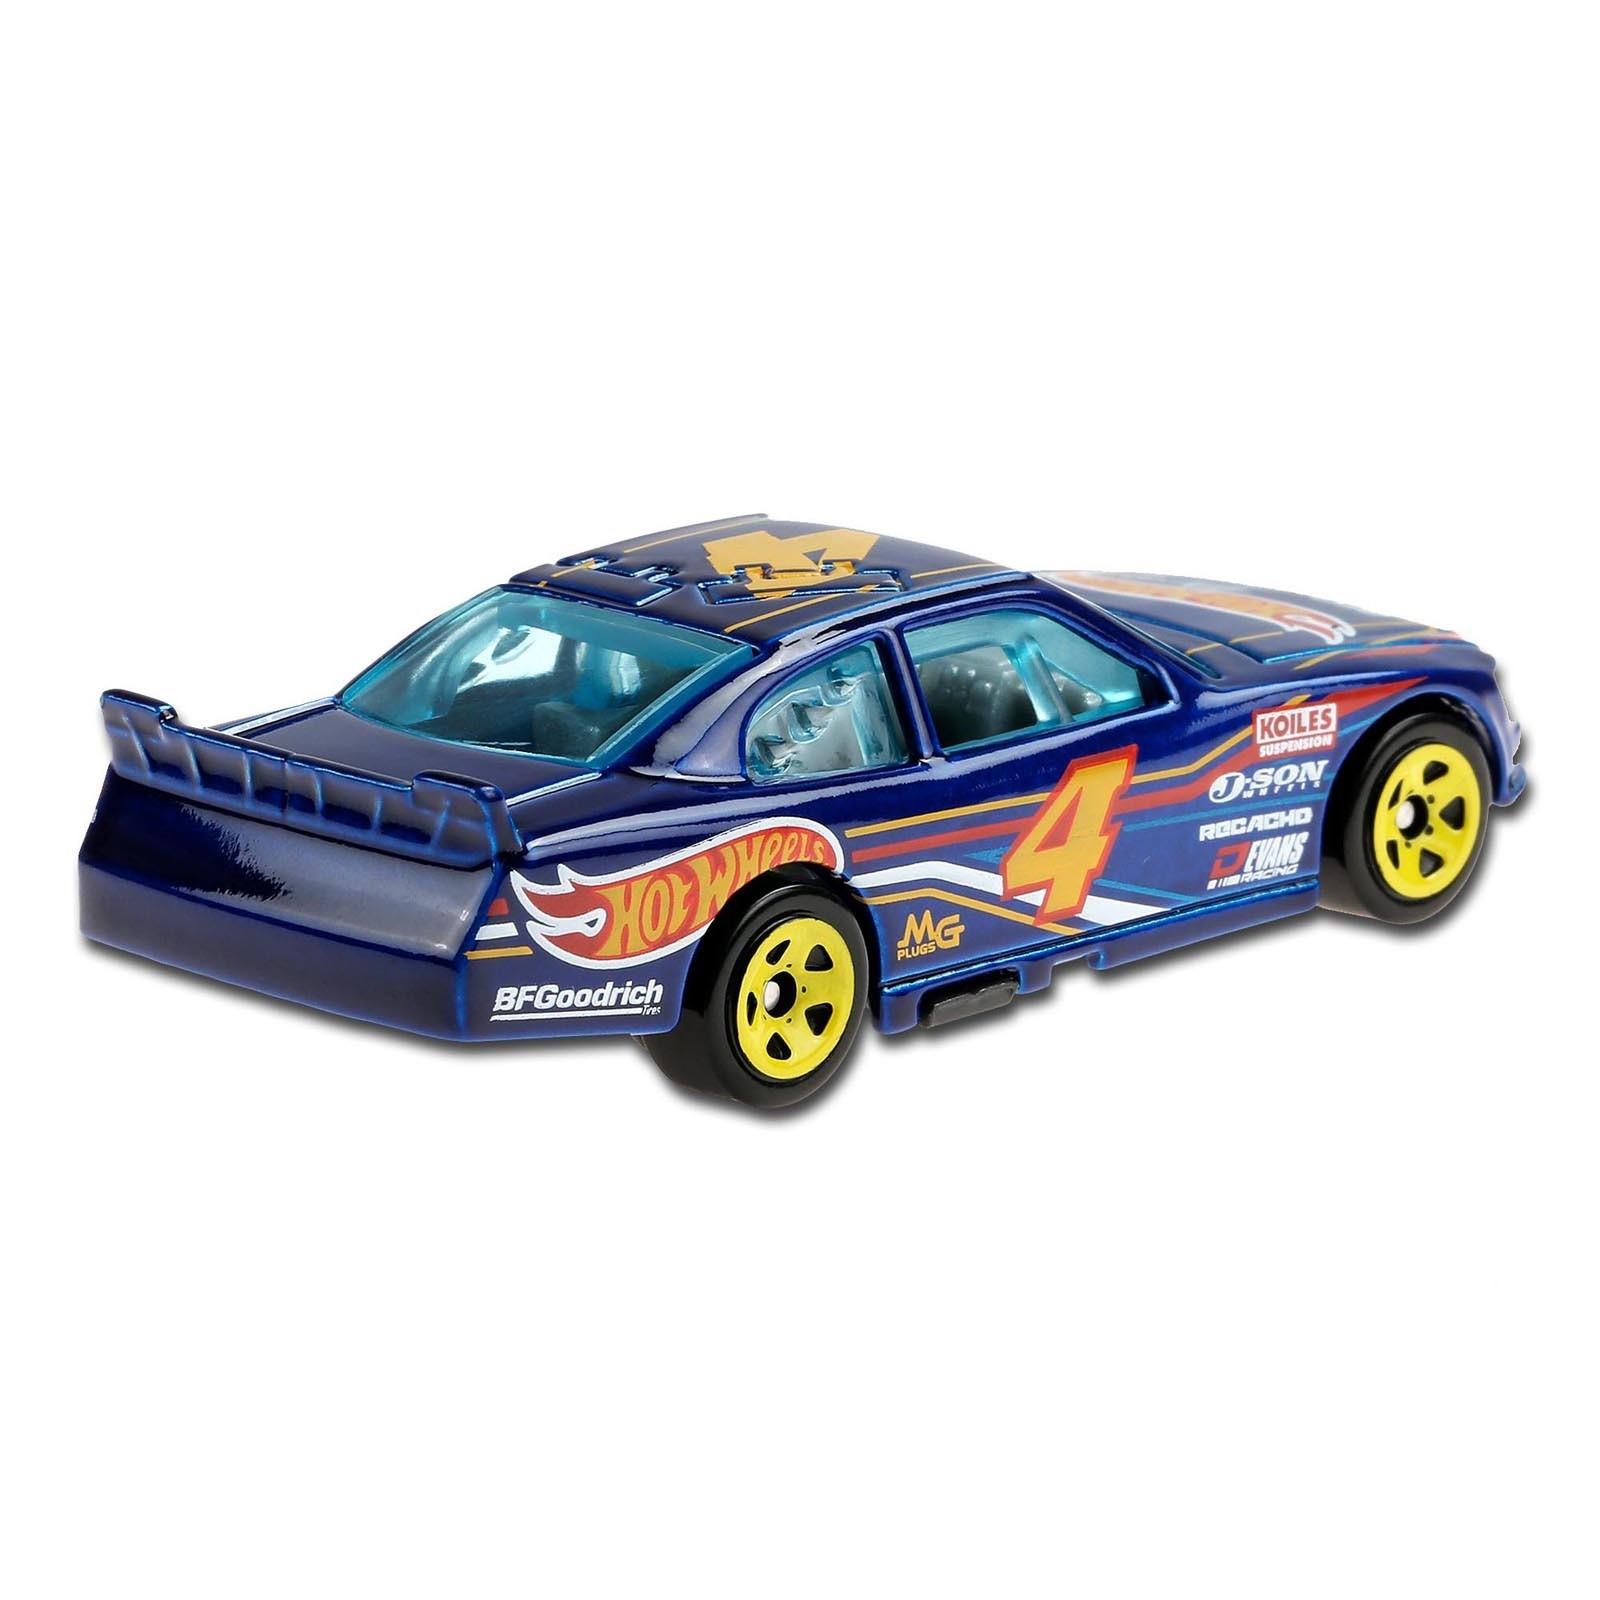 Hot Wheels - 2010 Chevy Impala - GHC57